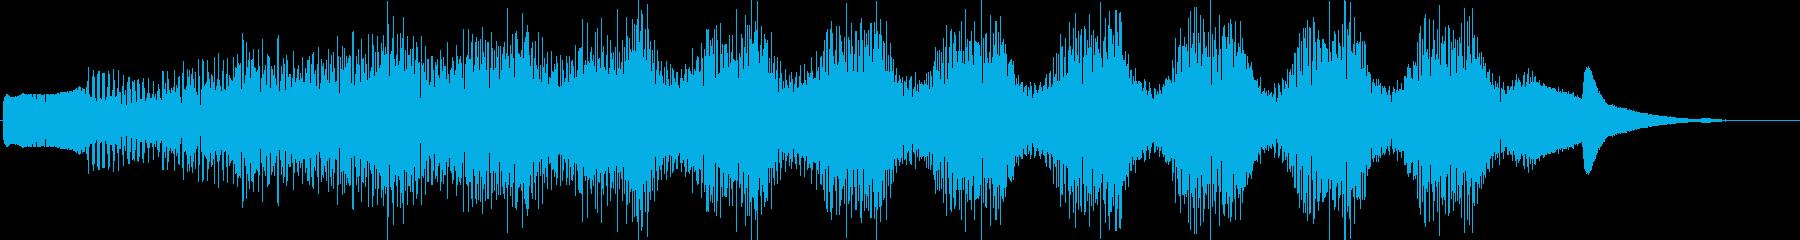 KANT考えてる時の音効果音08312の再生済みの波形